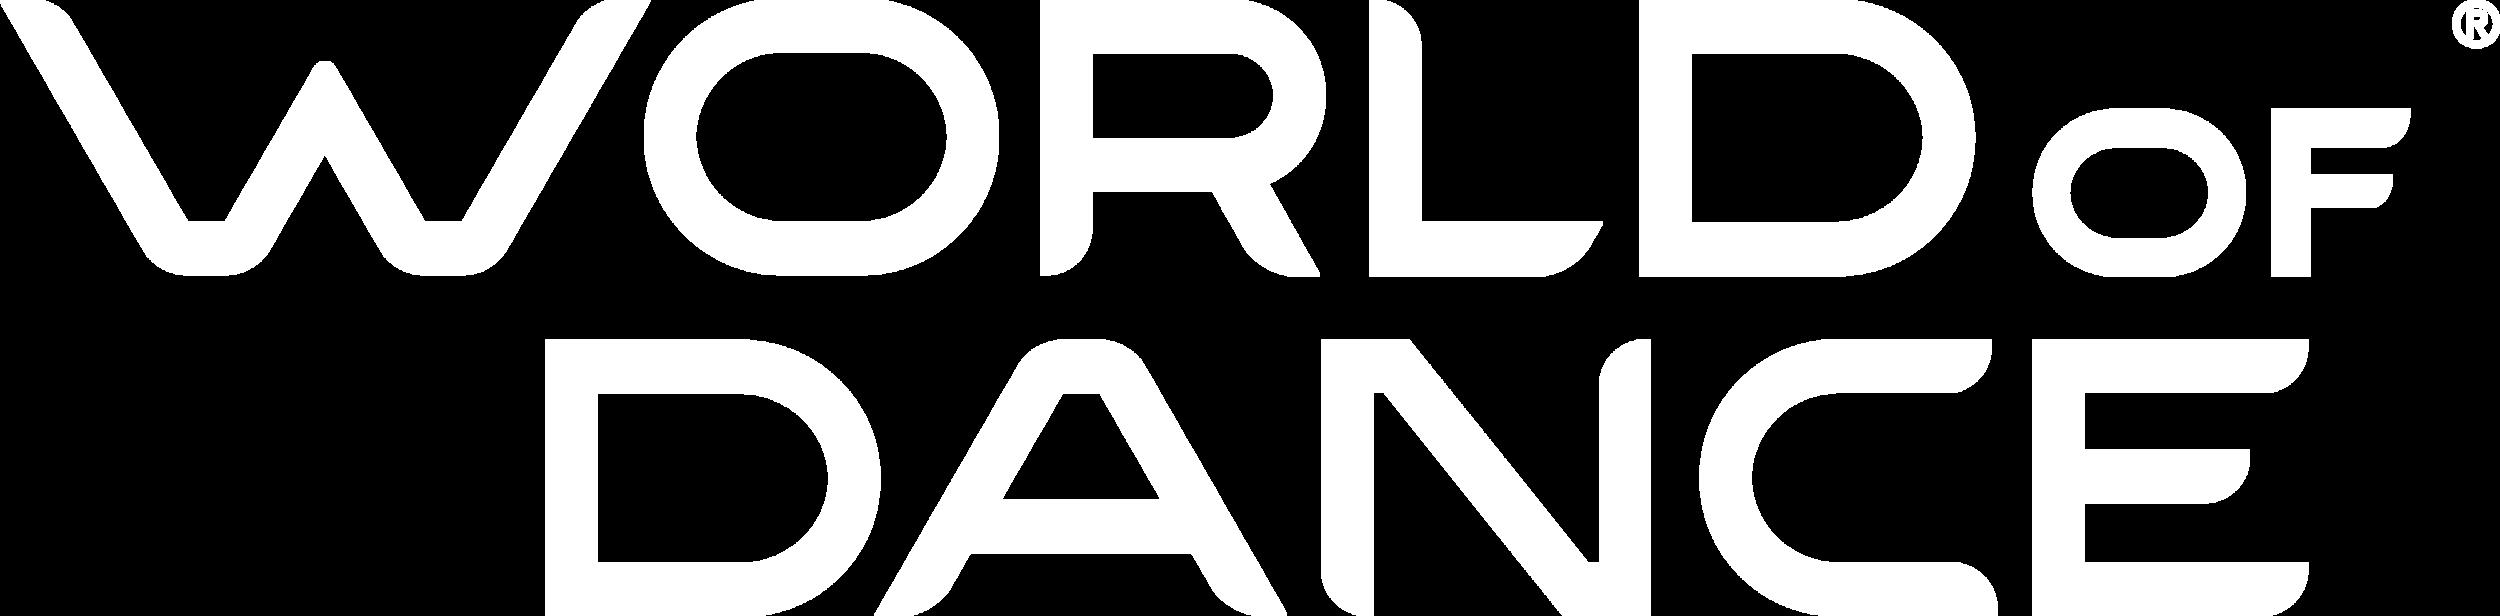 WOD white logo.png